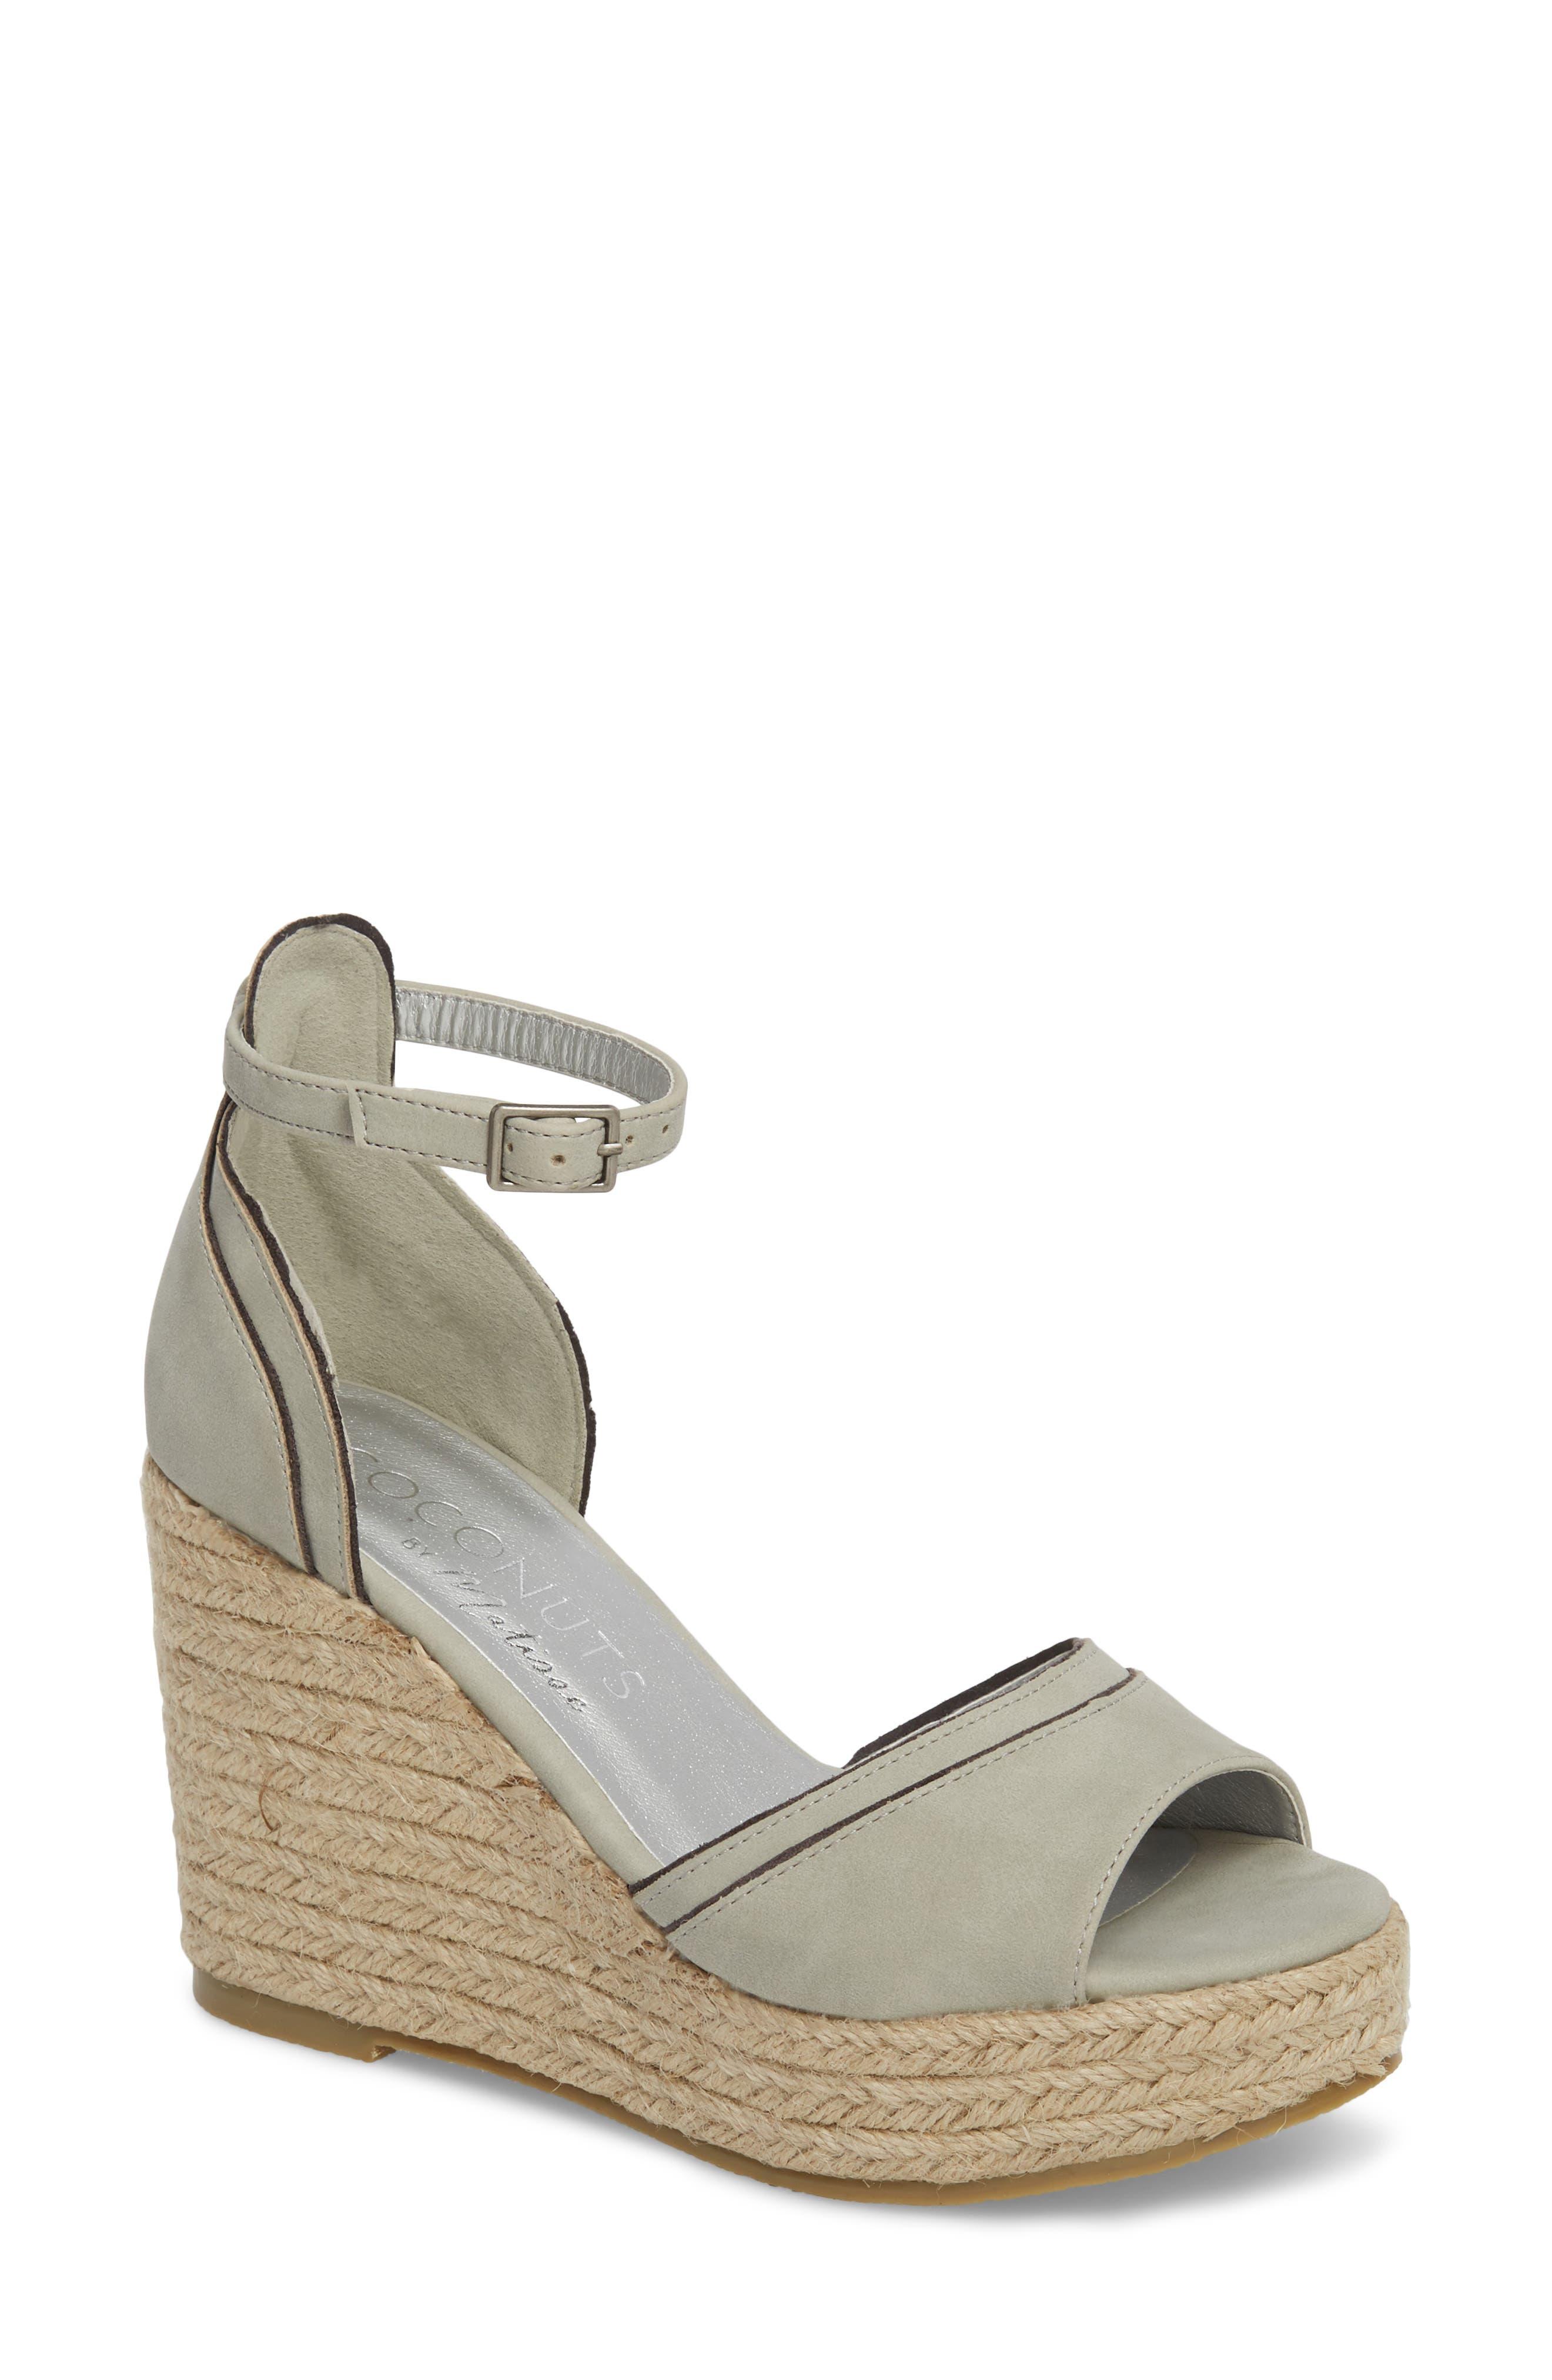 Bon Voyage Espadrille Wedge Sandal,                         Main,                         color, Grey Fabric